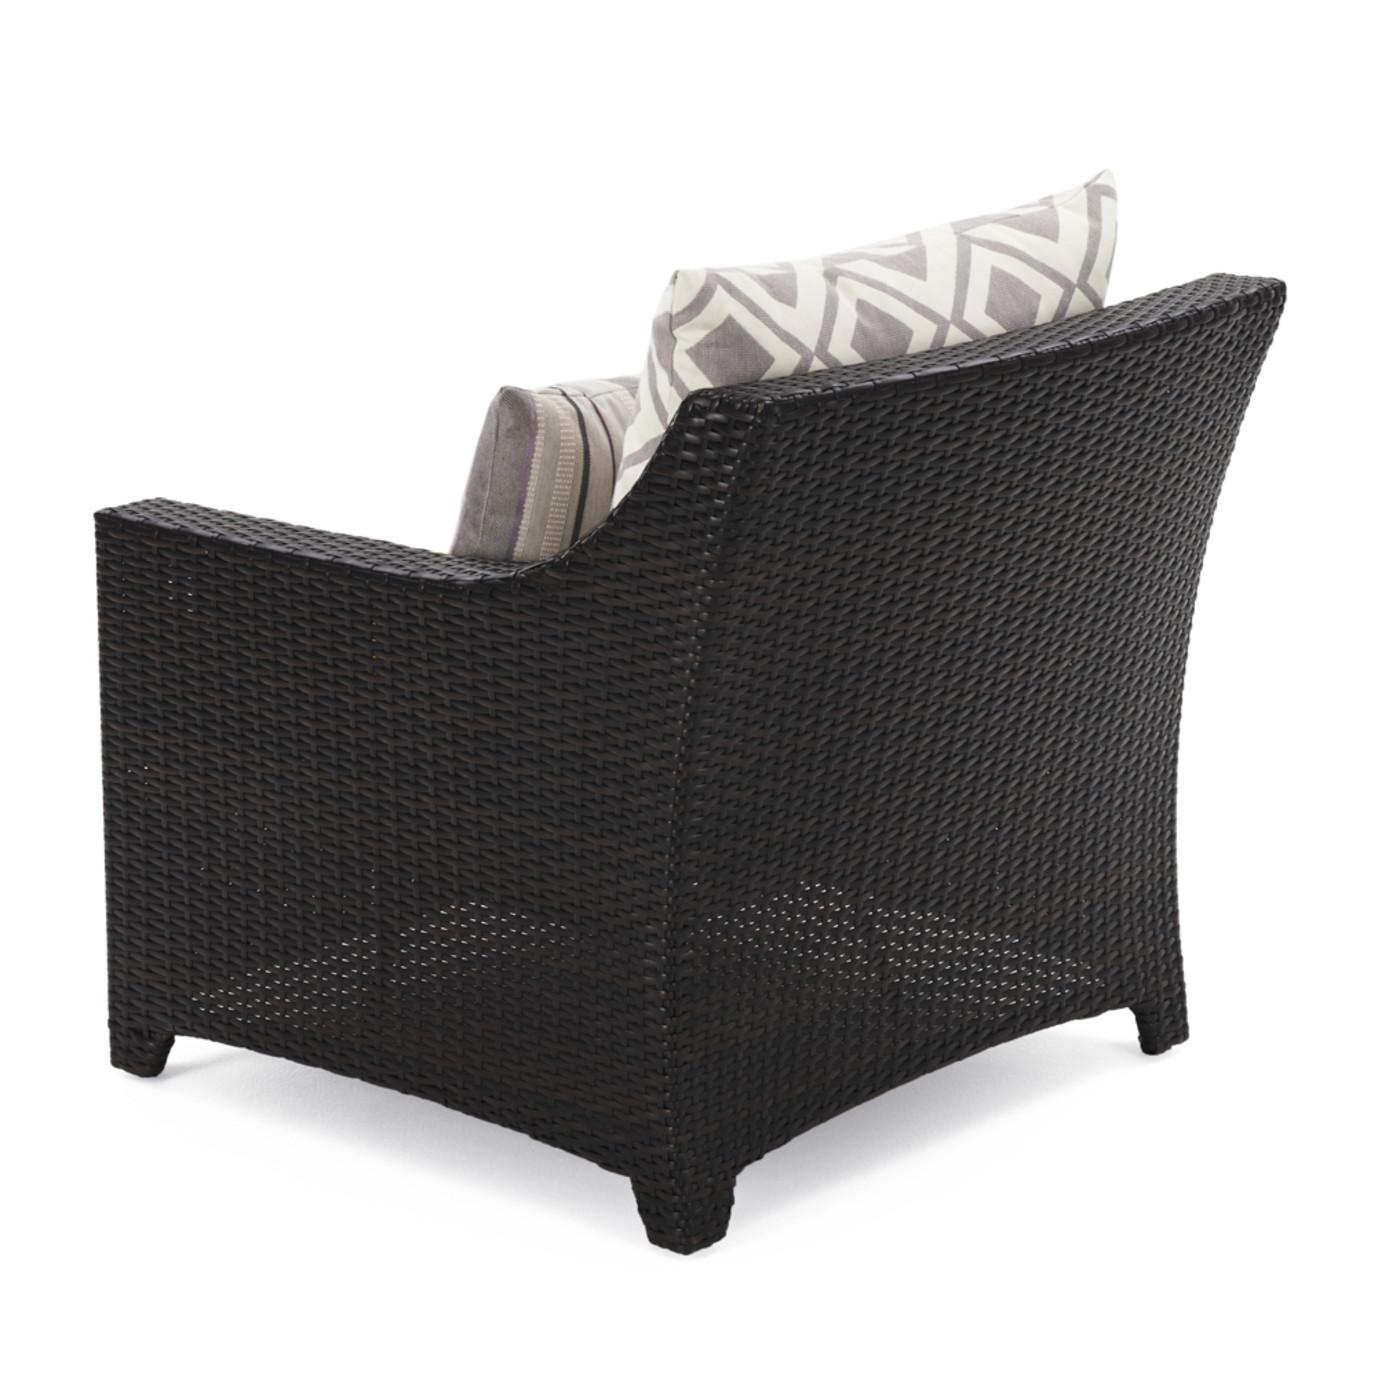 Deco™ 8pc Sofa & Club Chair Set - Wisteria Lavender